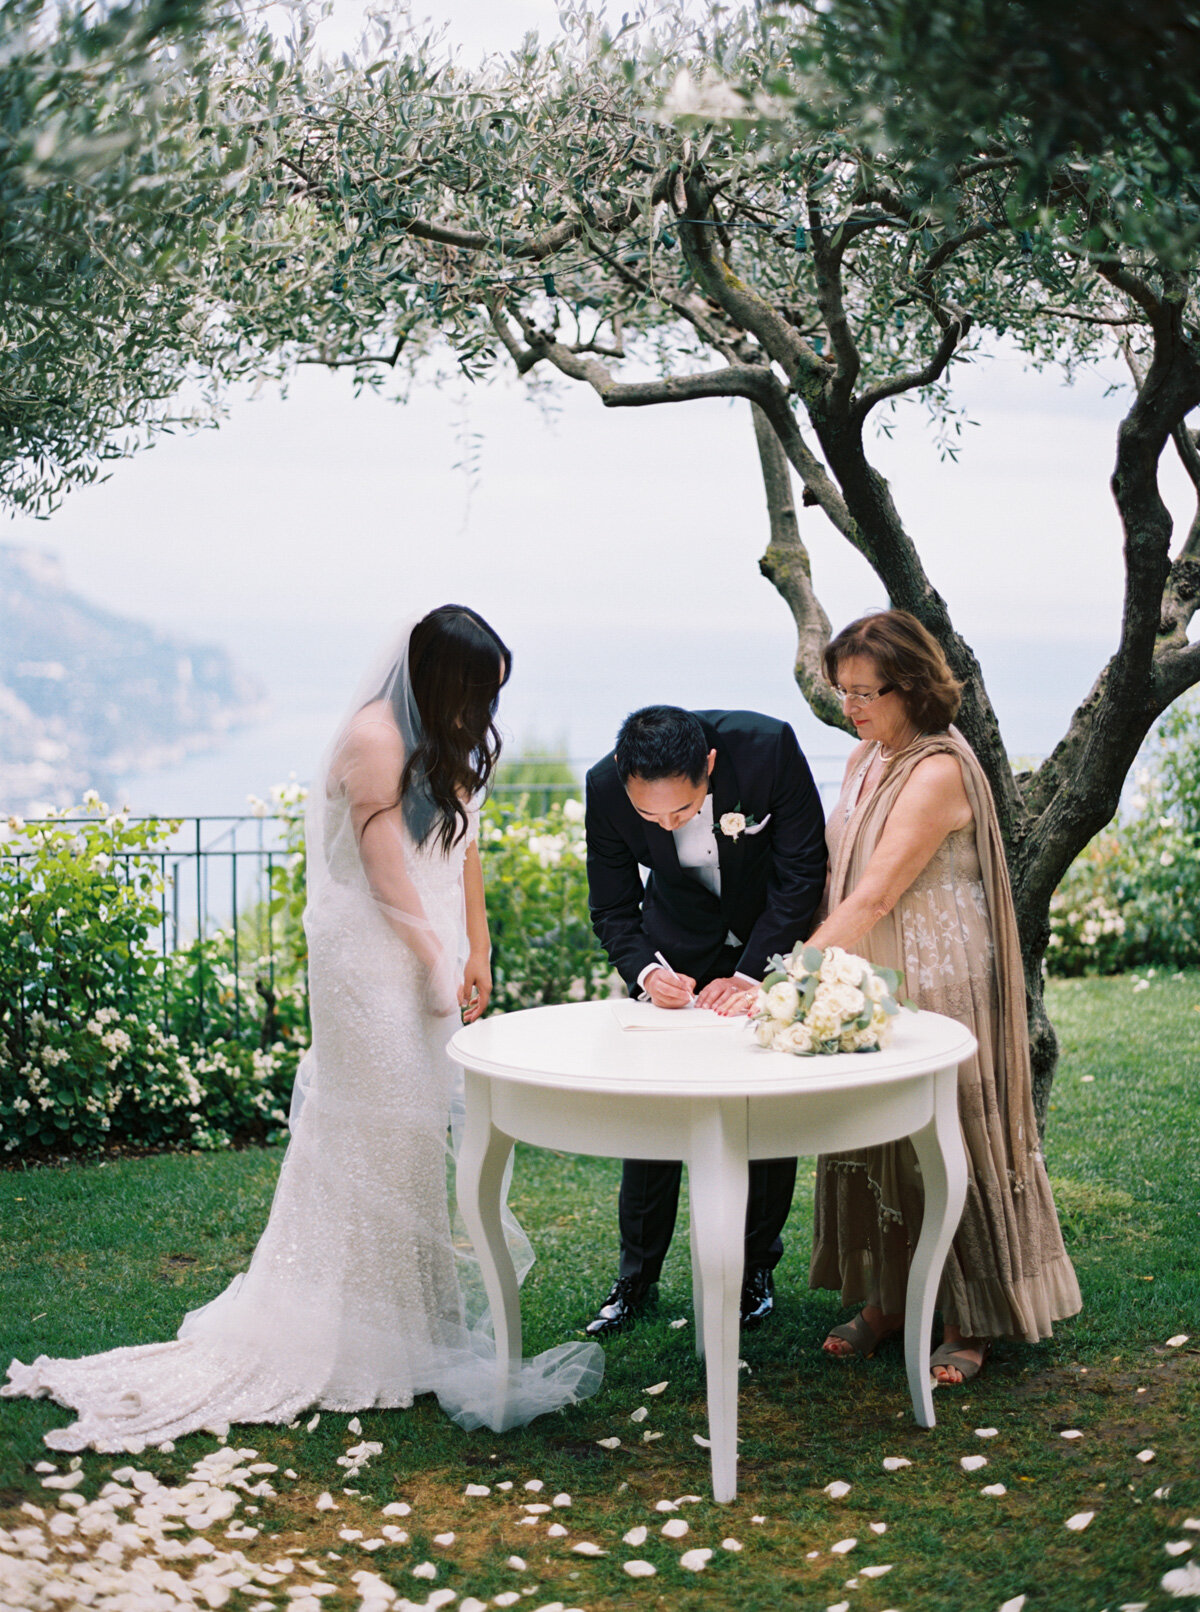 Belmond-Hotel-Caruso-ravello-elopement-Katie-Grant-destination-wedding (30 of 50).jpg